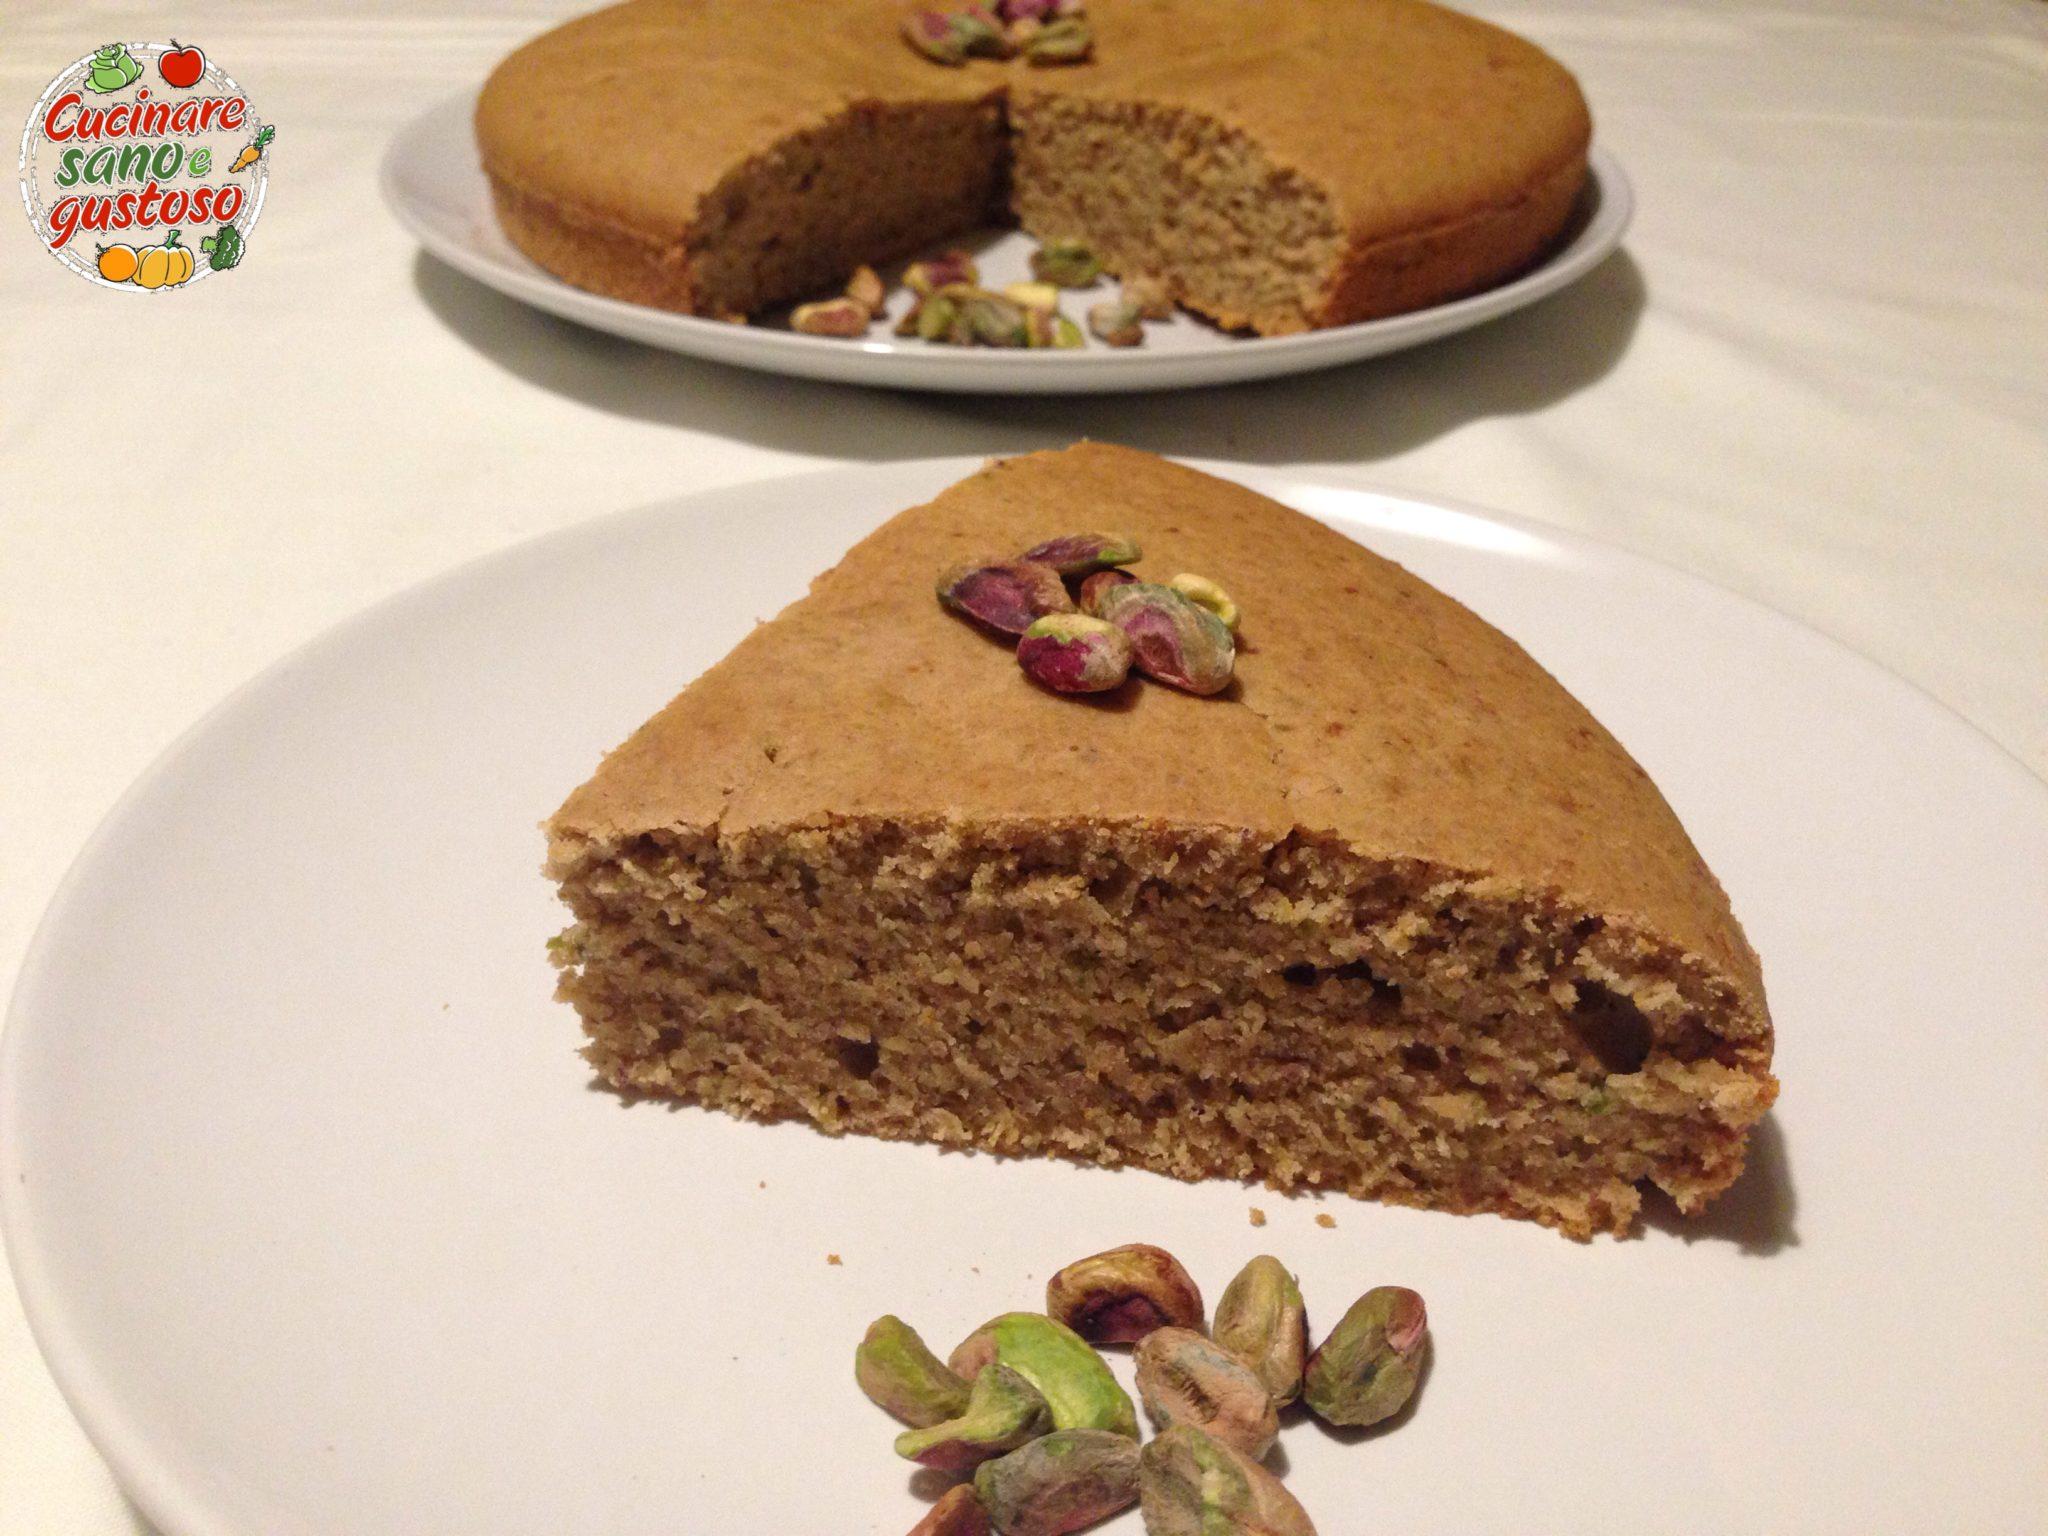 Torta multicereale al pistacchio cucinare sano e gustoso - Cucinare sano e gustoso ...